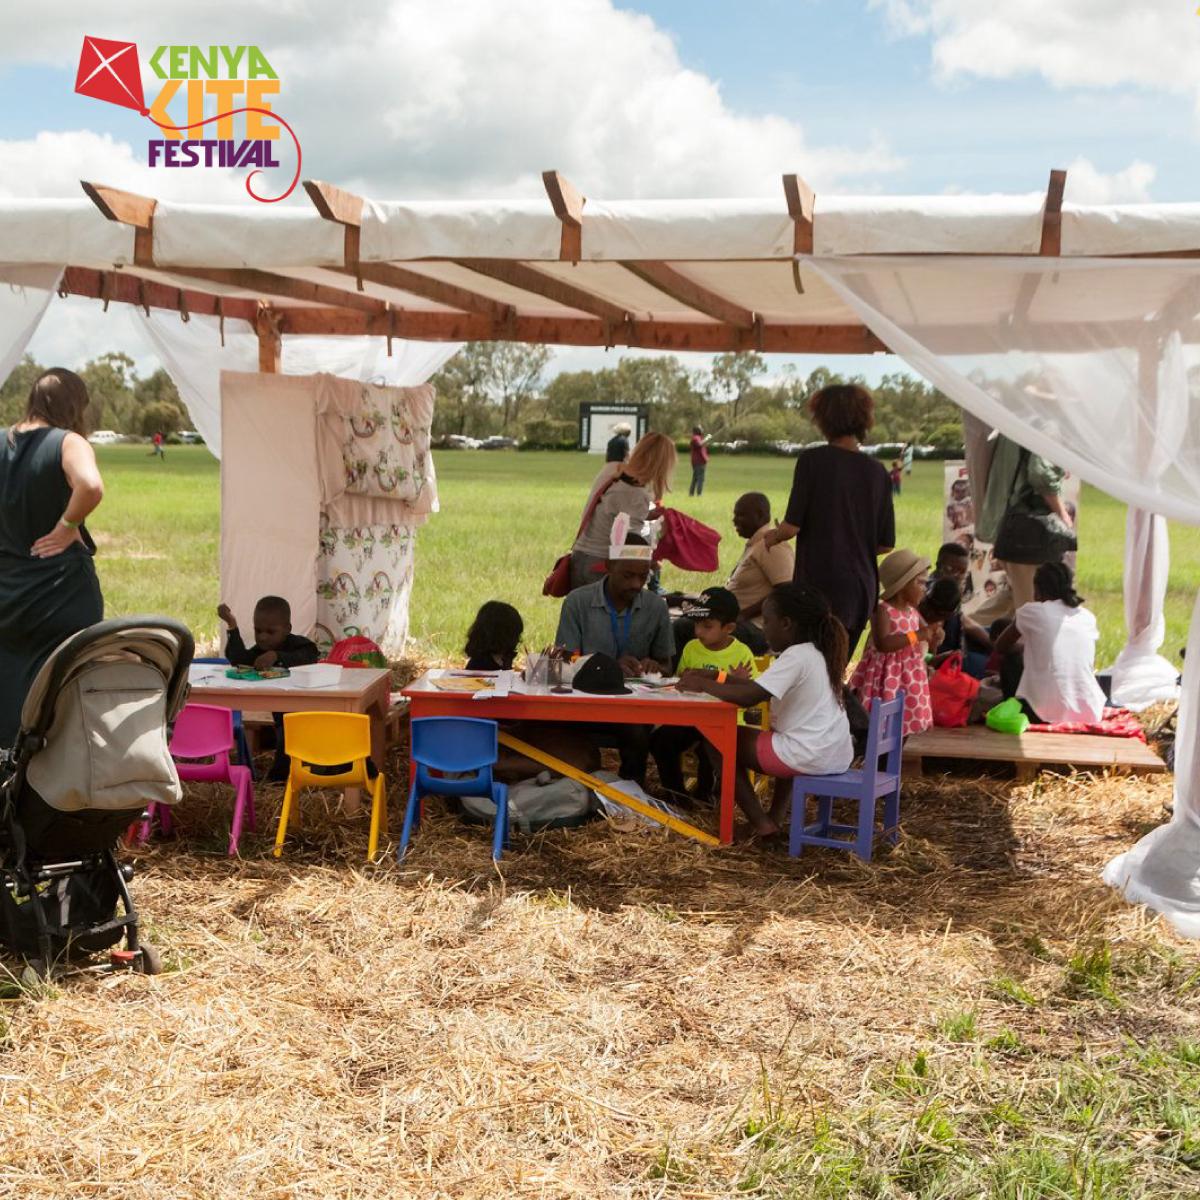 As always we will have a kiddy area set up. Where the kids can enjoy crafts, games and puppet shows.  #kidstagram #kidactivites #kidsart #kiddyarea #Kenyakitefestivalpic.twitter.com/6CRnrJvlpq